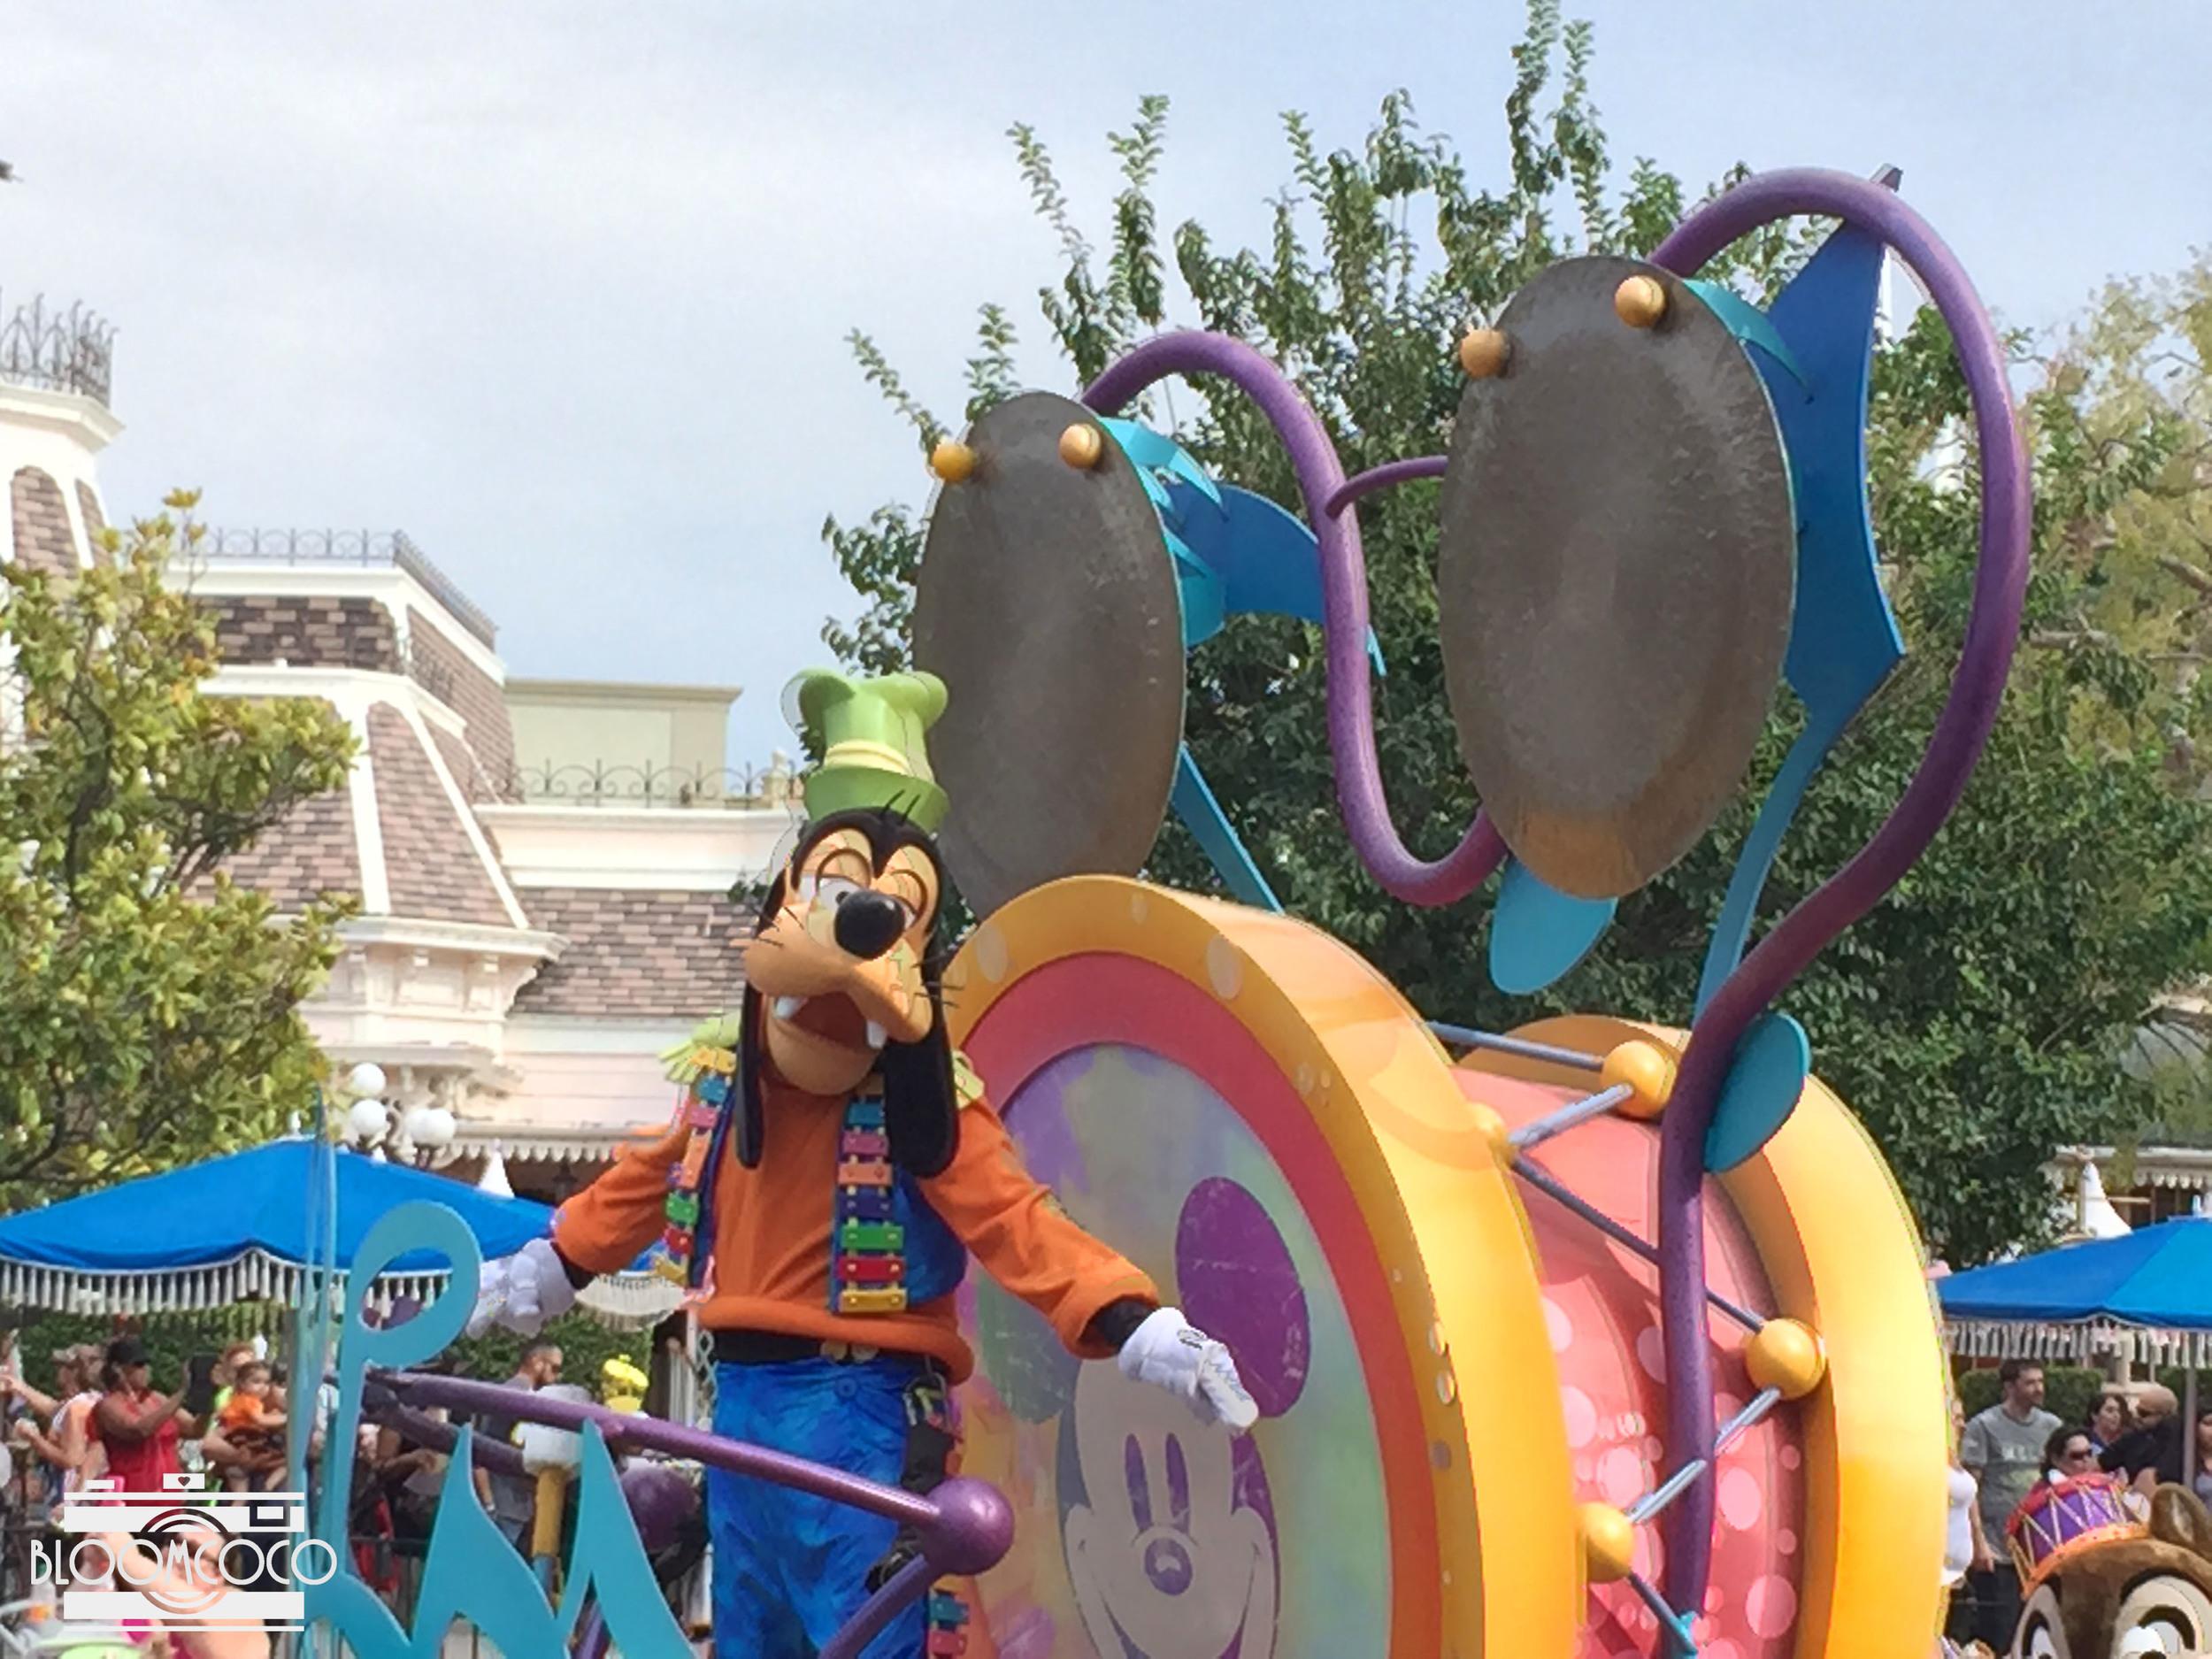 DisneyLandMickey'sHalloweenParty6.jpg